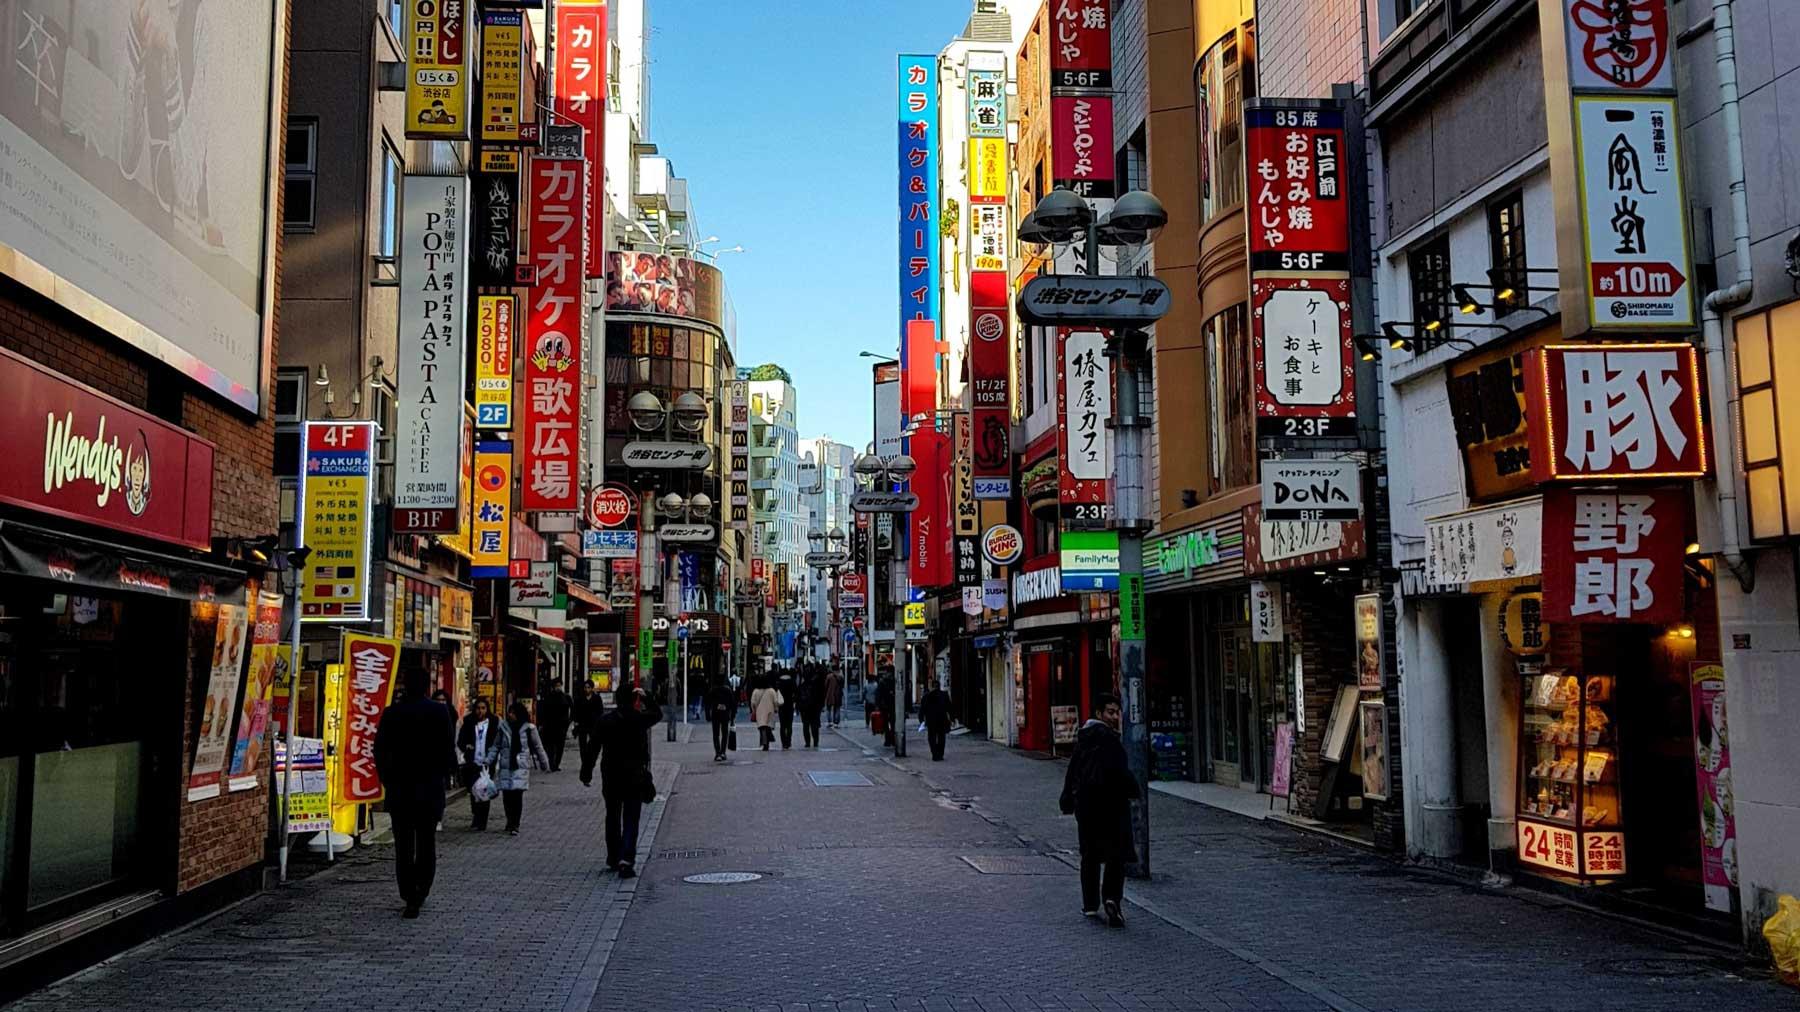 Family Travel Japan: Day 1, Tokyo